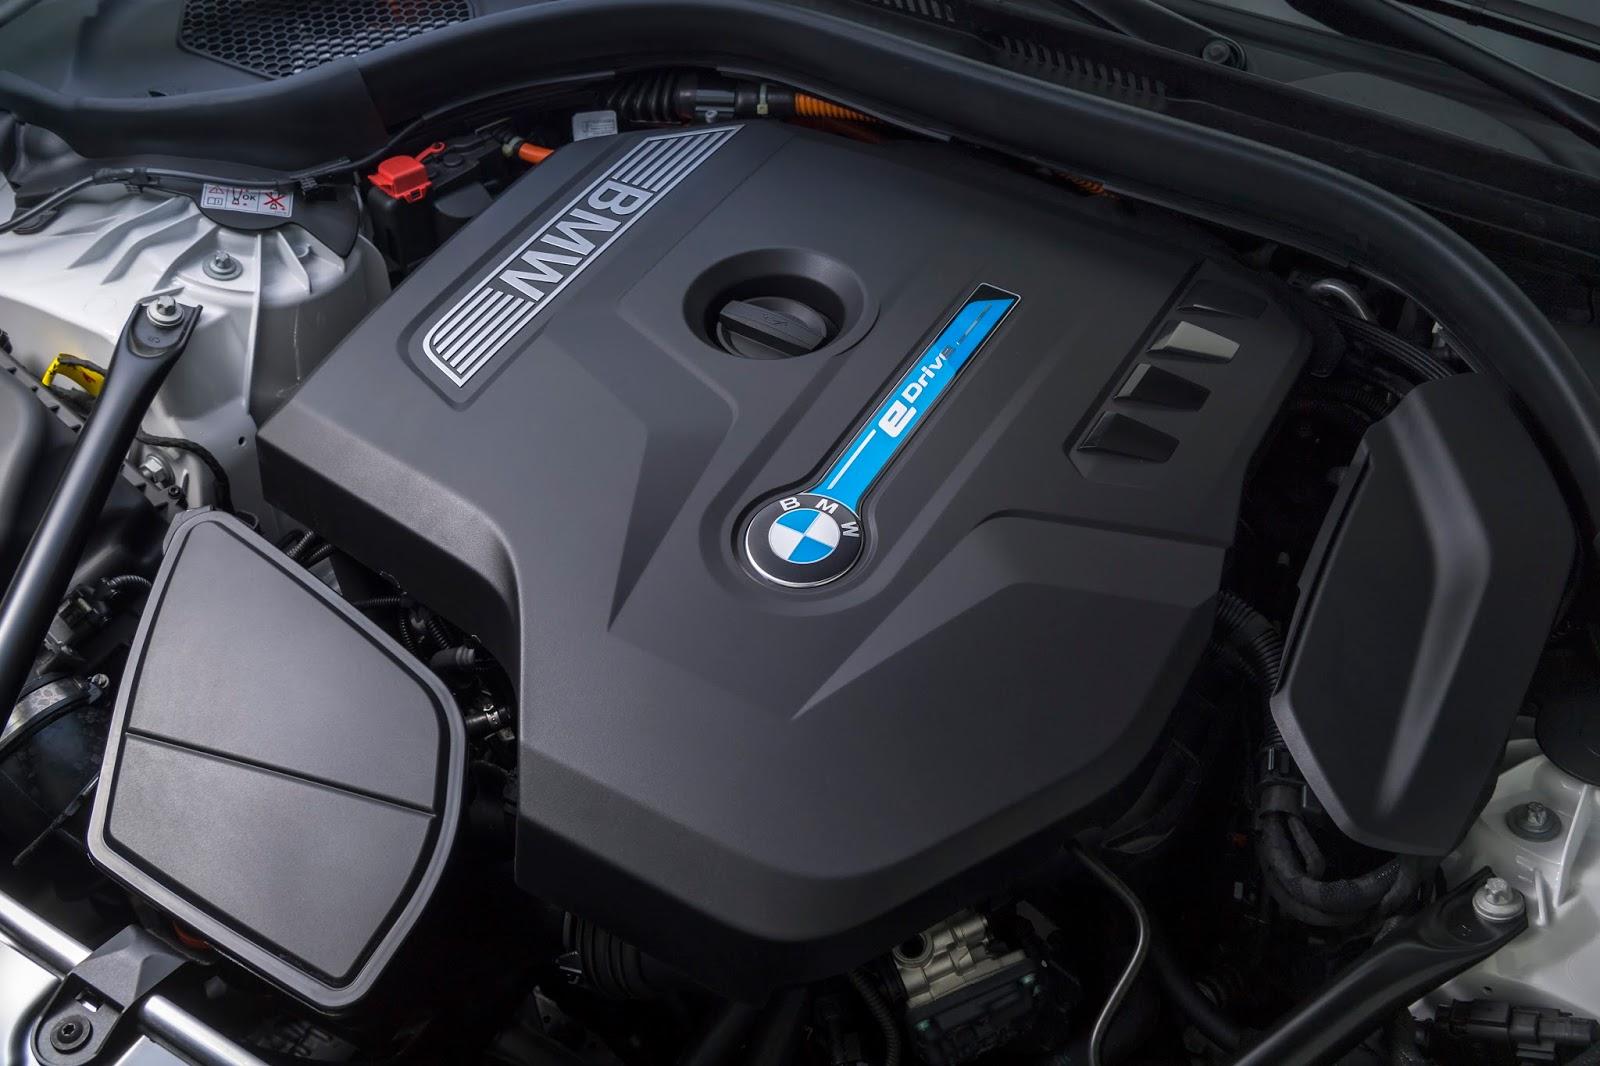 P90256387 highRes the new bmw 530e ipe Η BMW 530e iPerformance φέρνει την ηλεκτρική επανάσταση BMW, BMW 5, BMW 530e iPerformance, Electric cars, Hybrid, Λανσάρισμα